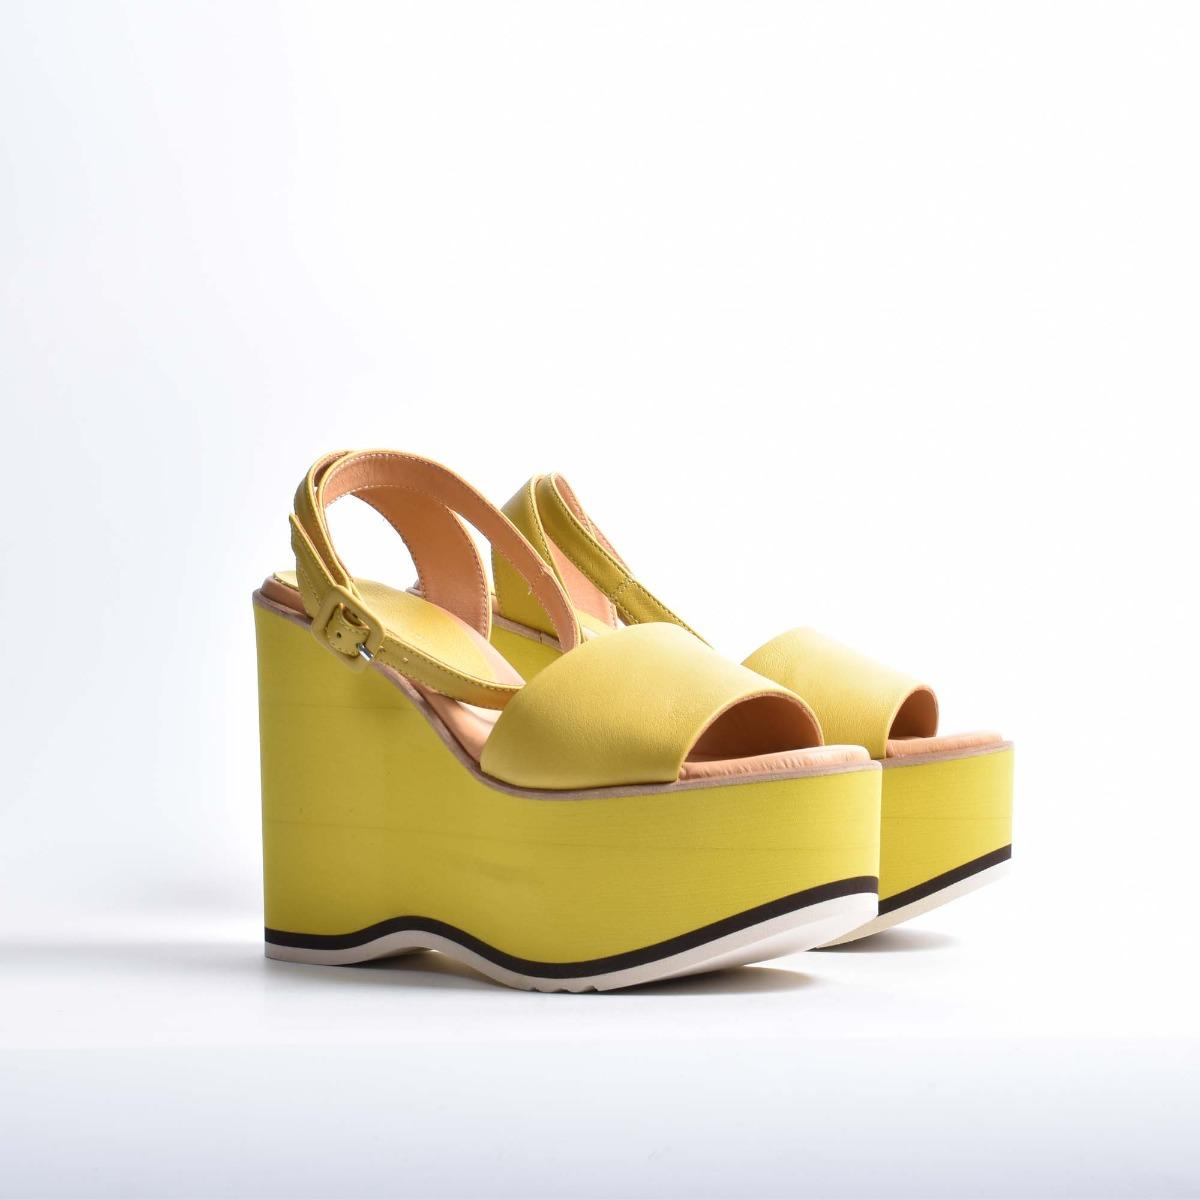 Sandalo maues napasoft - Curry